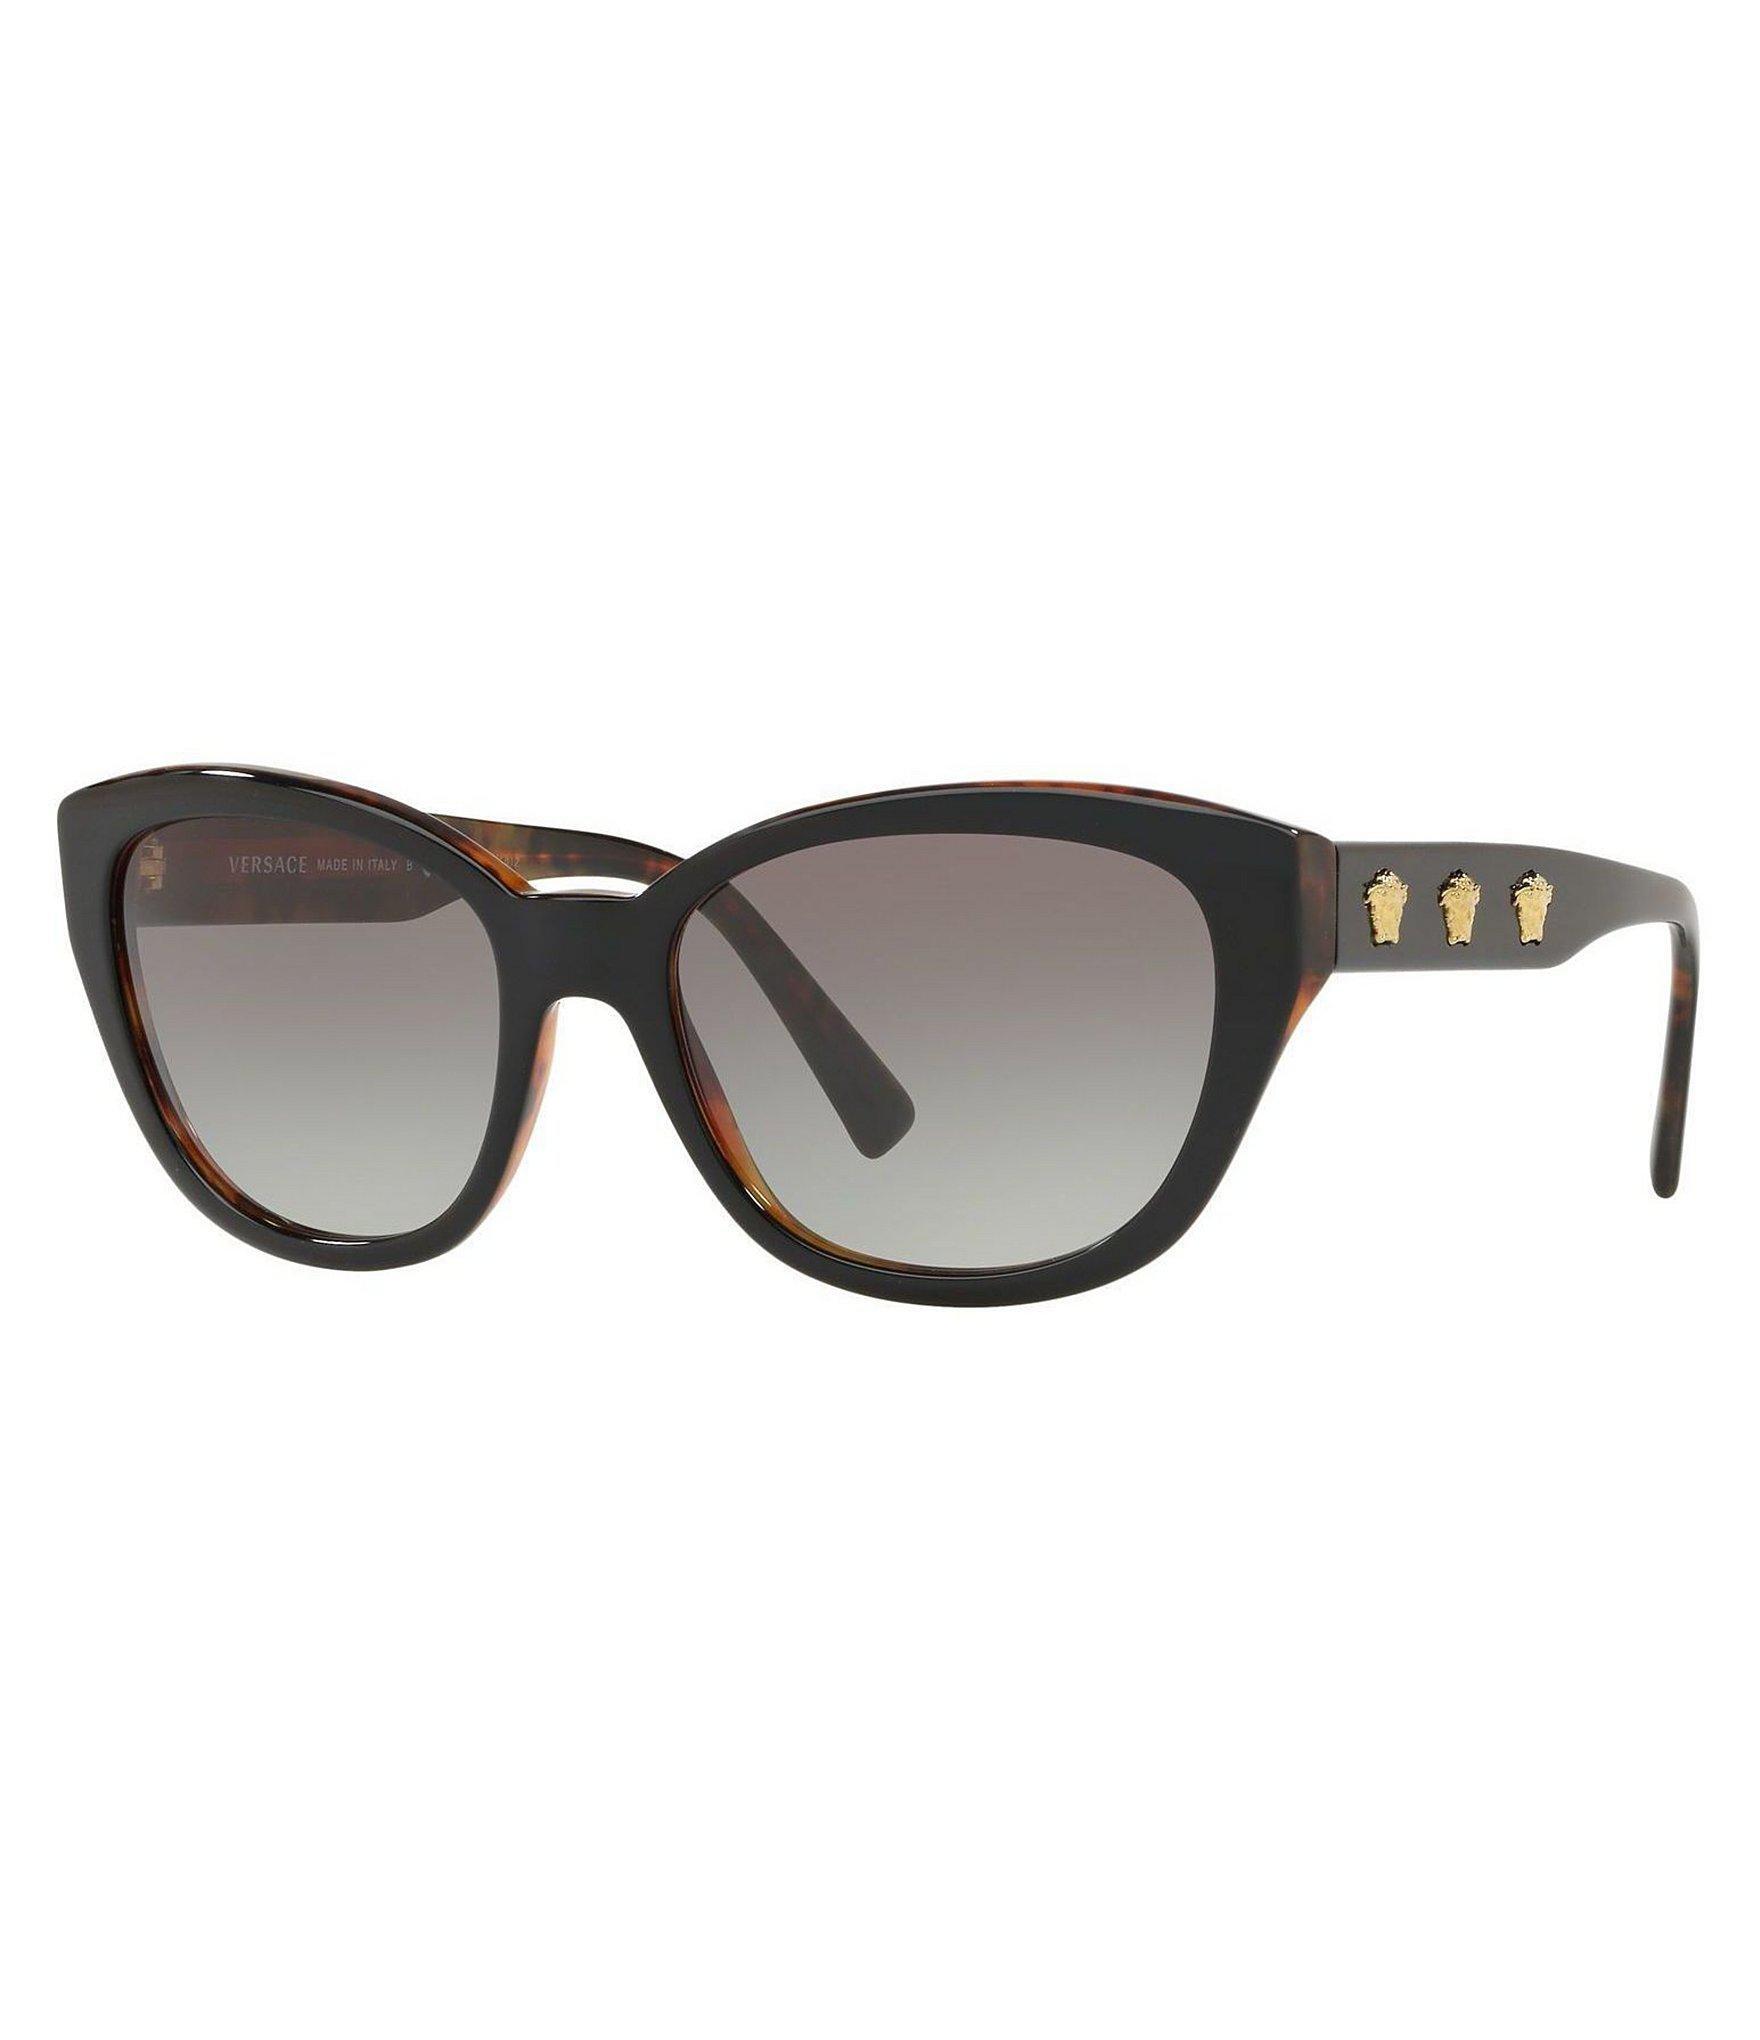 9c0685501 Lyst - Versace Medusa Rock Icon Sunglasses in Black